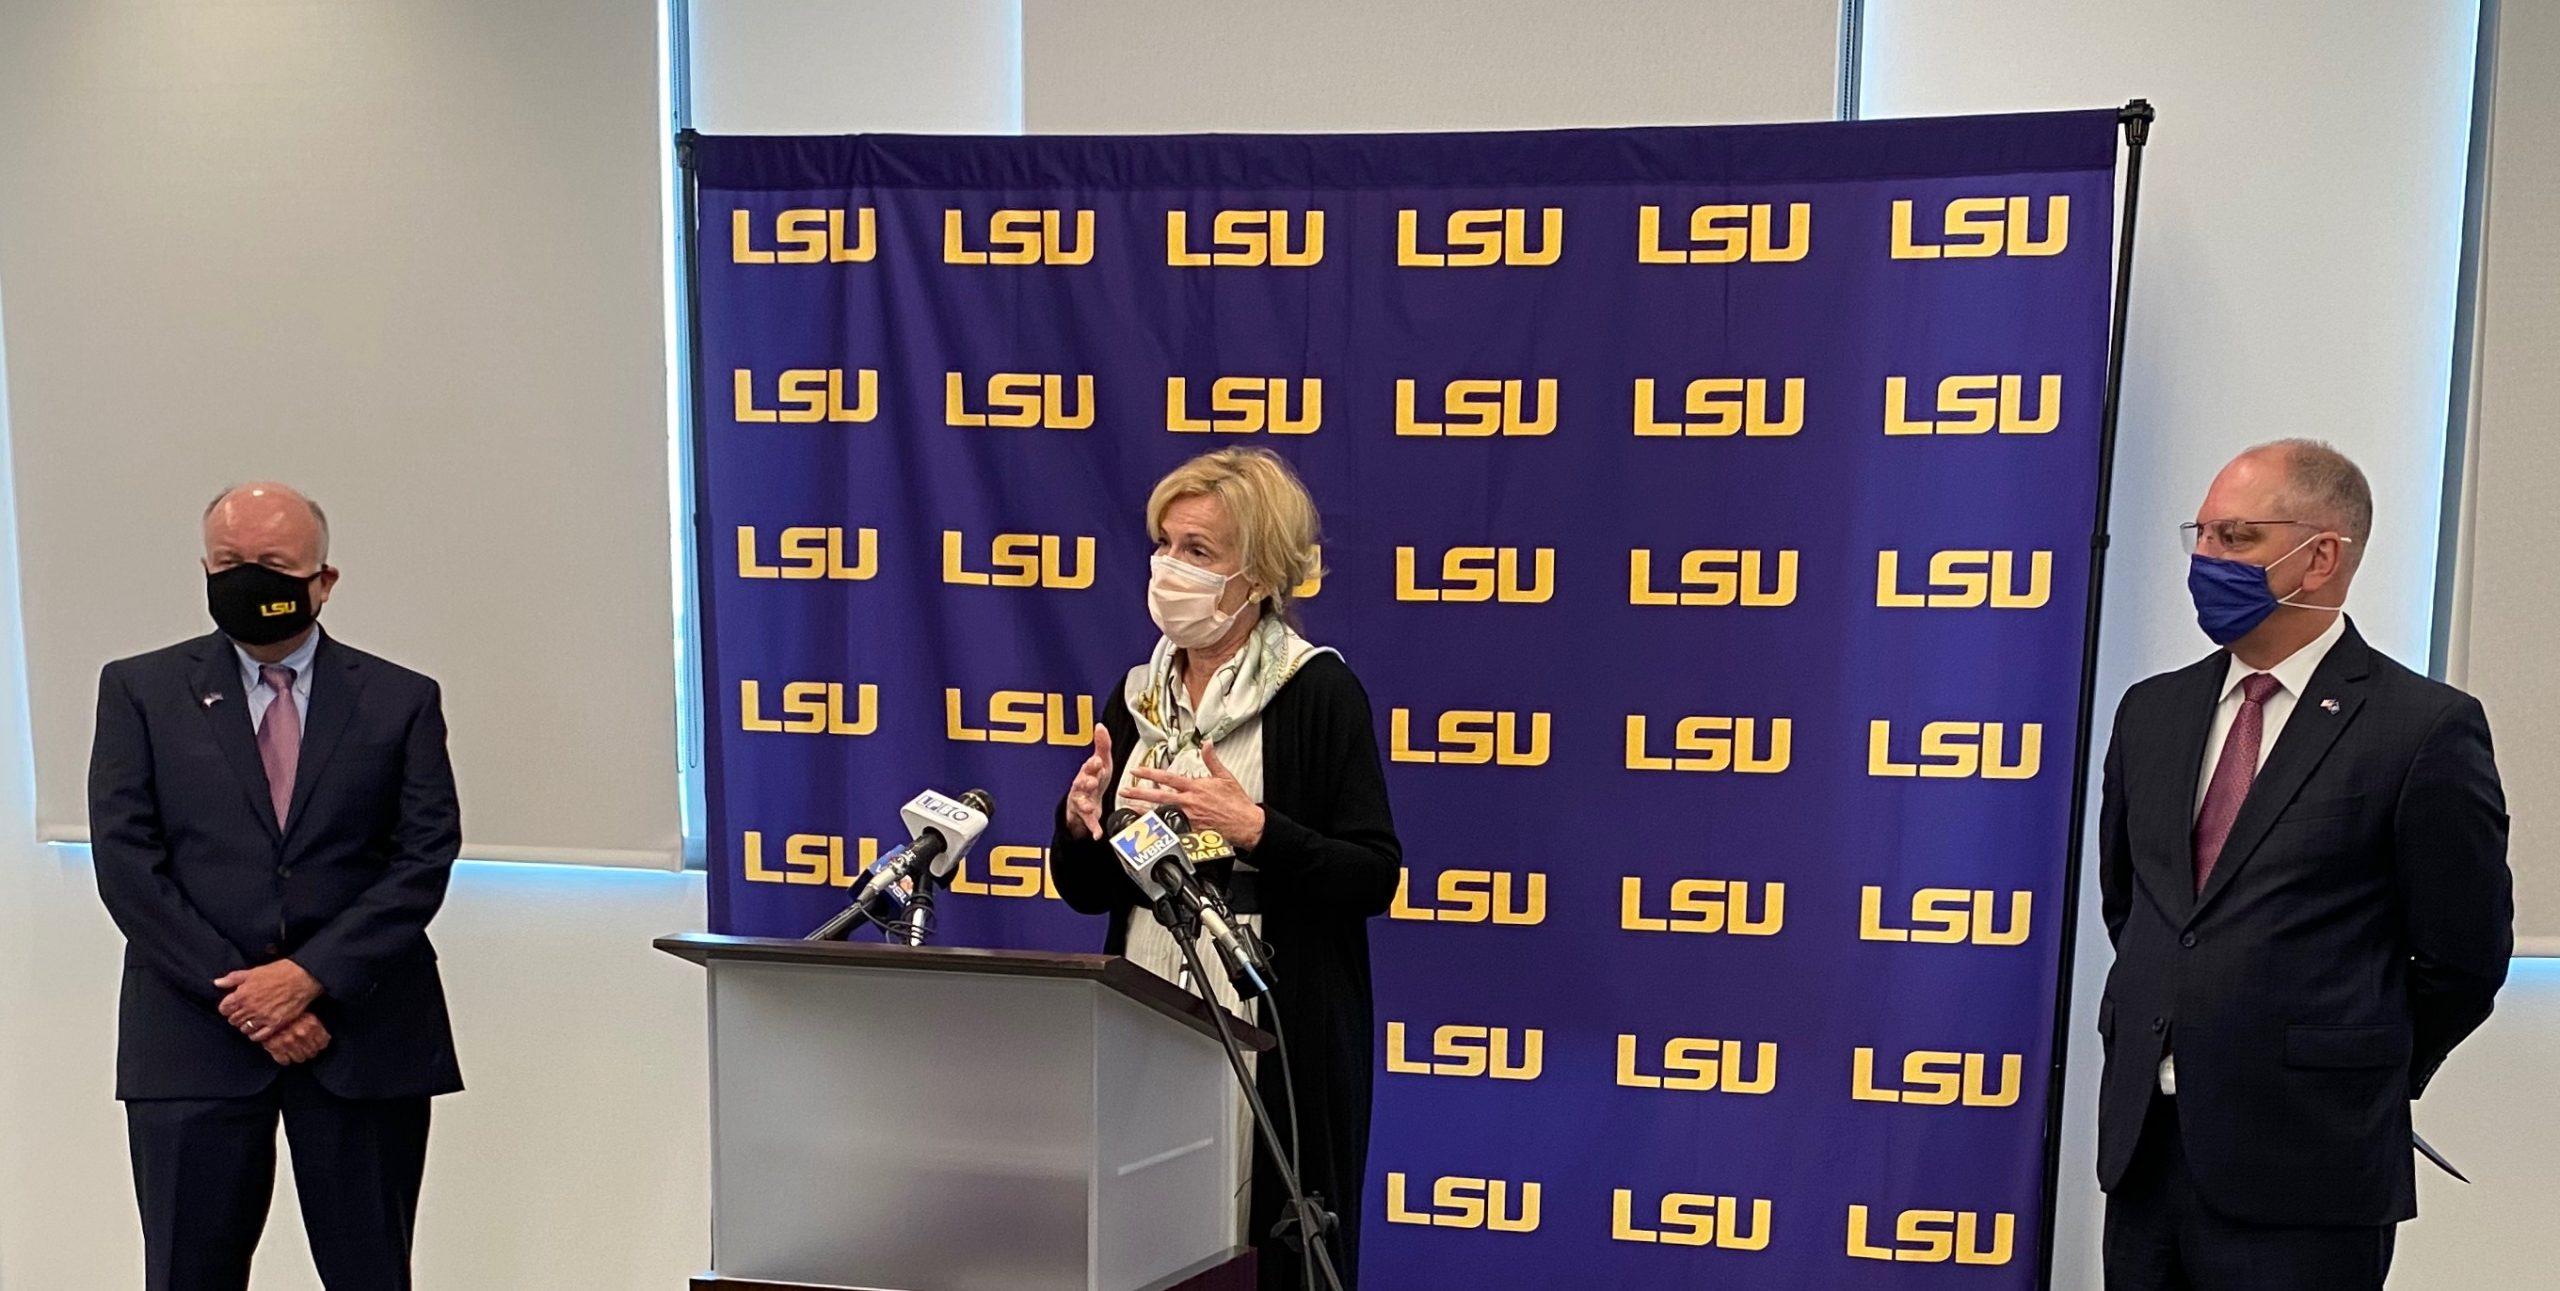 White House coronavirus advisor said Louisiana's COVID-19 restrictions 'saved people's lives'